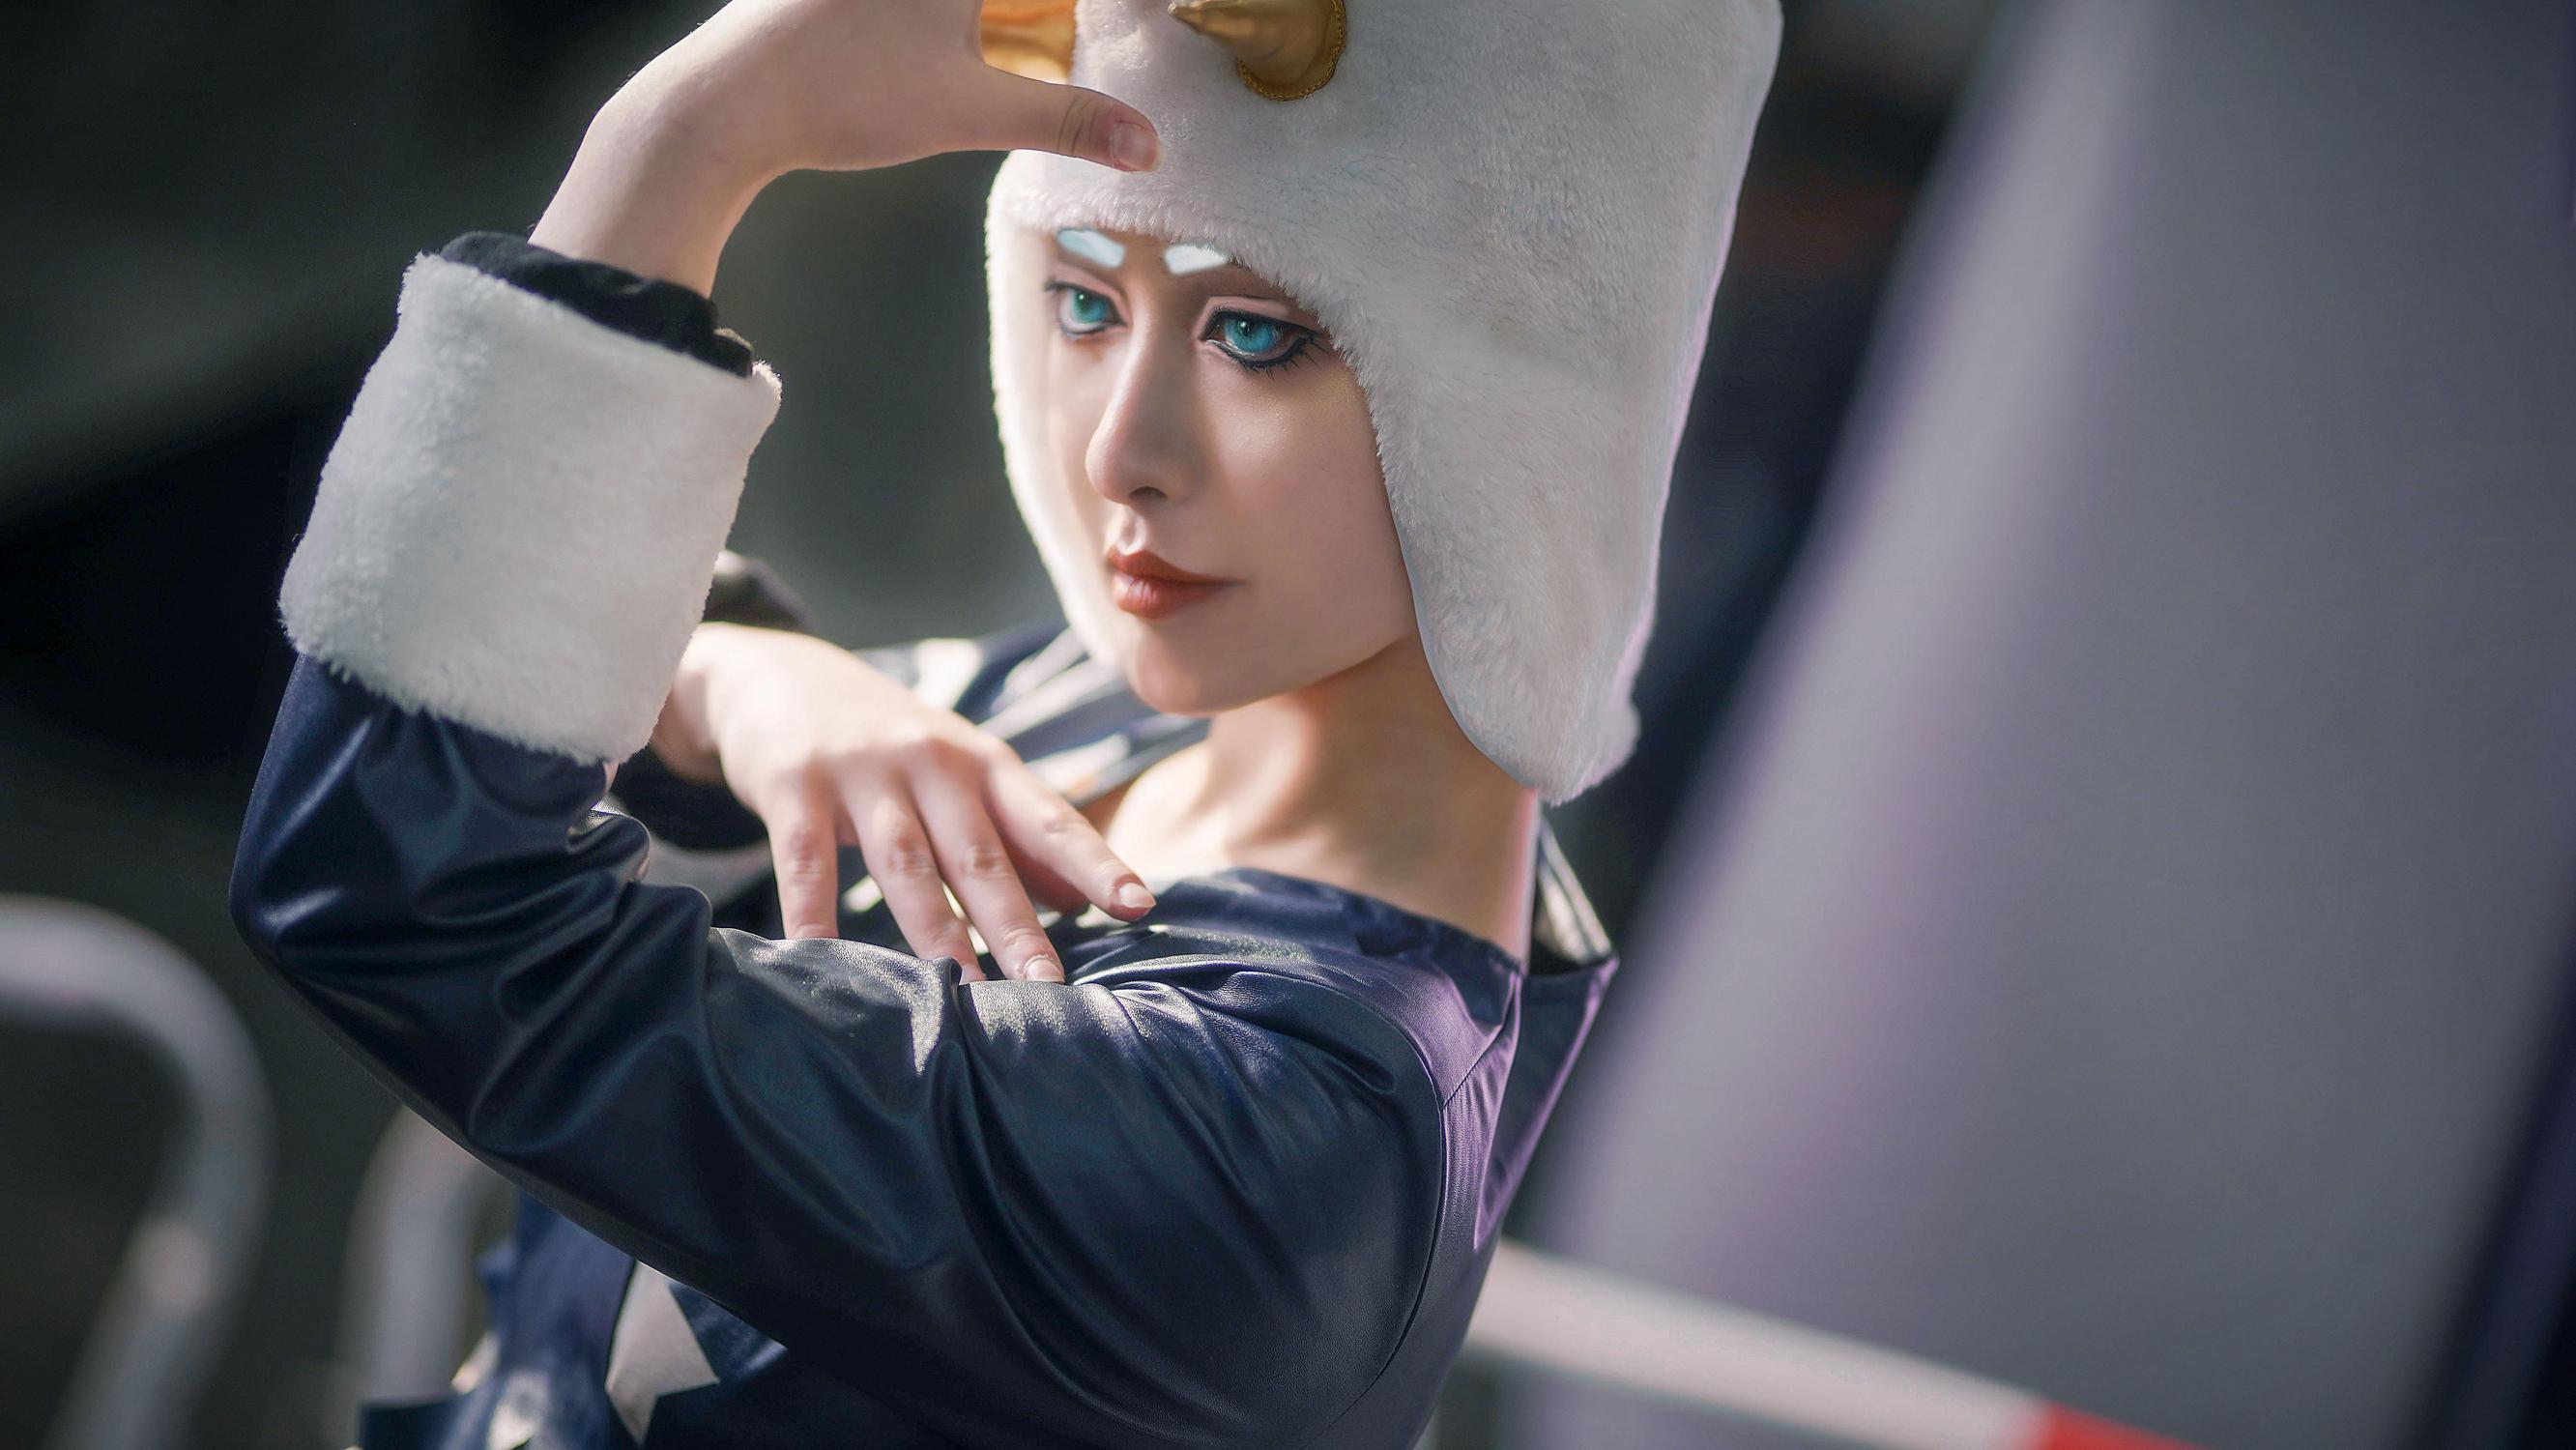 《JOJO的奇妙冒险》石之海cosplay【CN:Tariden_禾忆嘉】-第4张